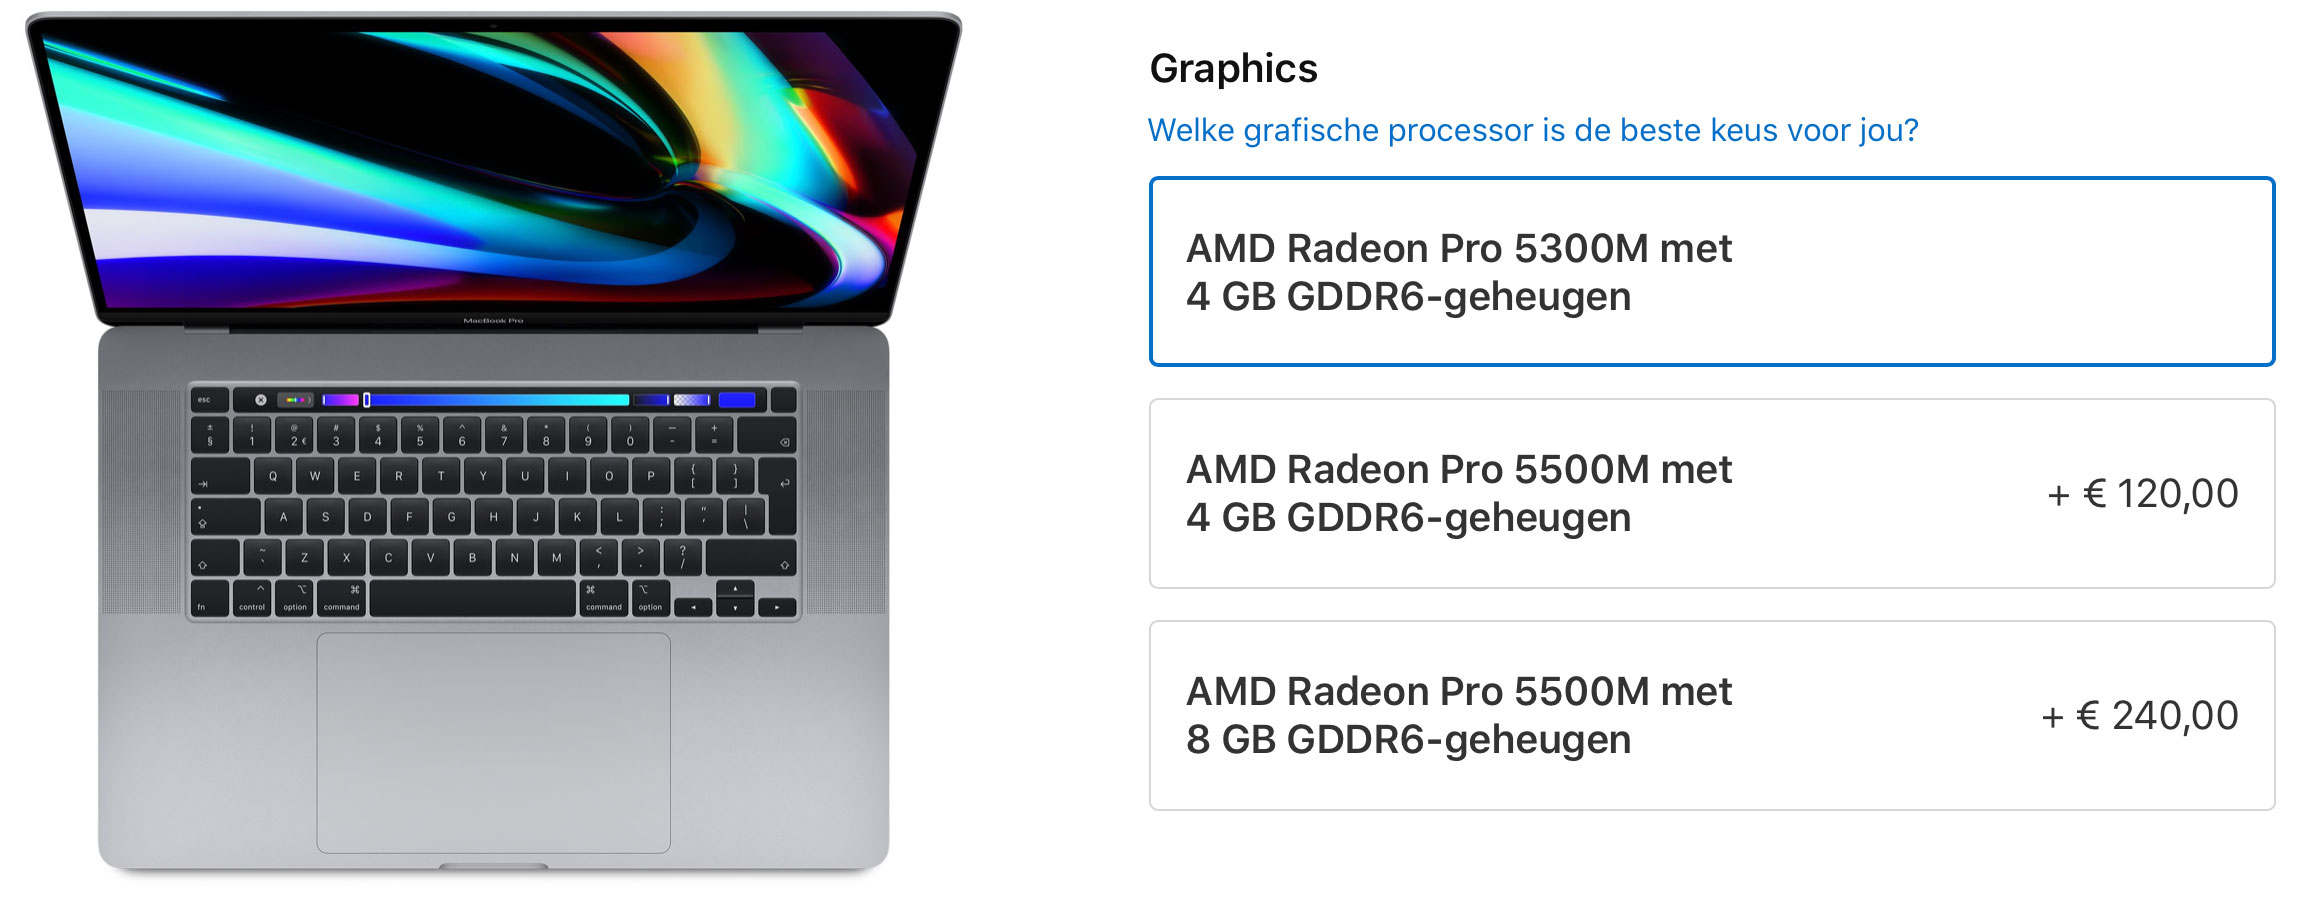 https://www.macfreak.nl/modules/news/images/zArt.16-inchMacBookProVideokaartOpties.jpg